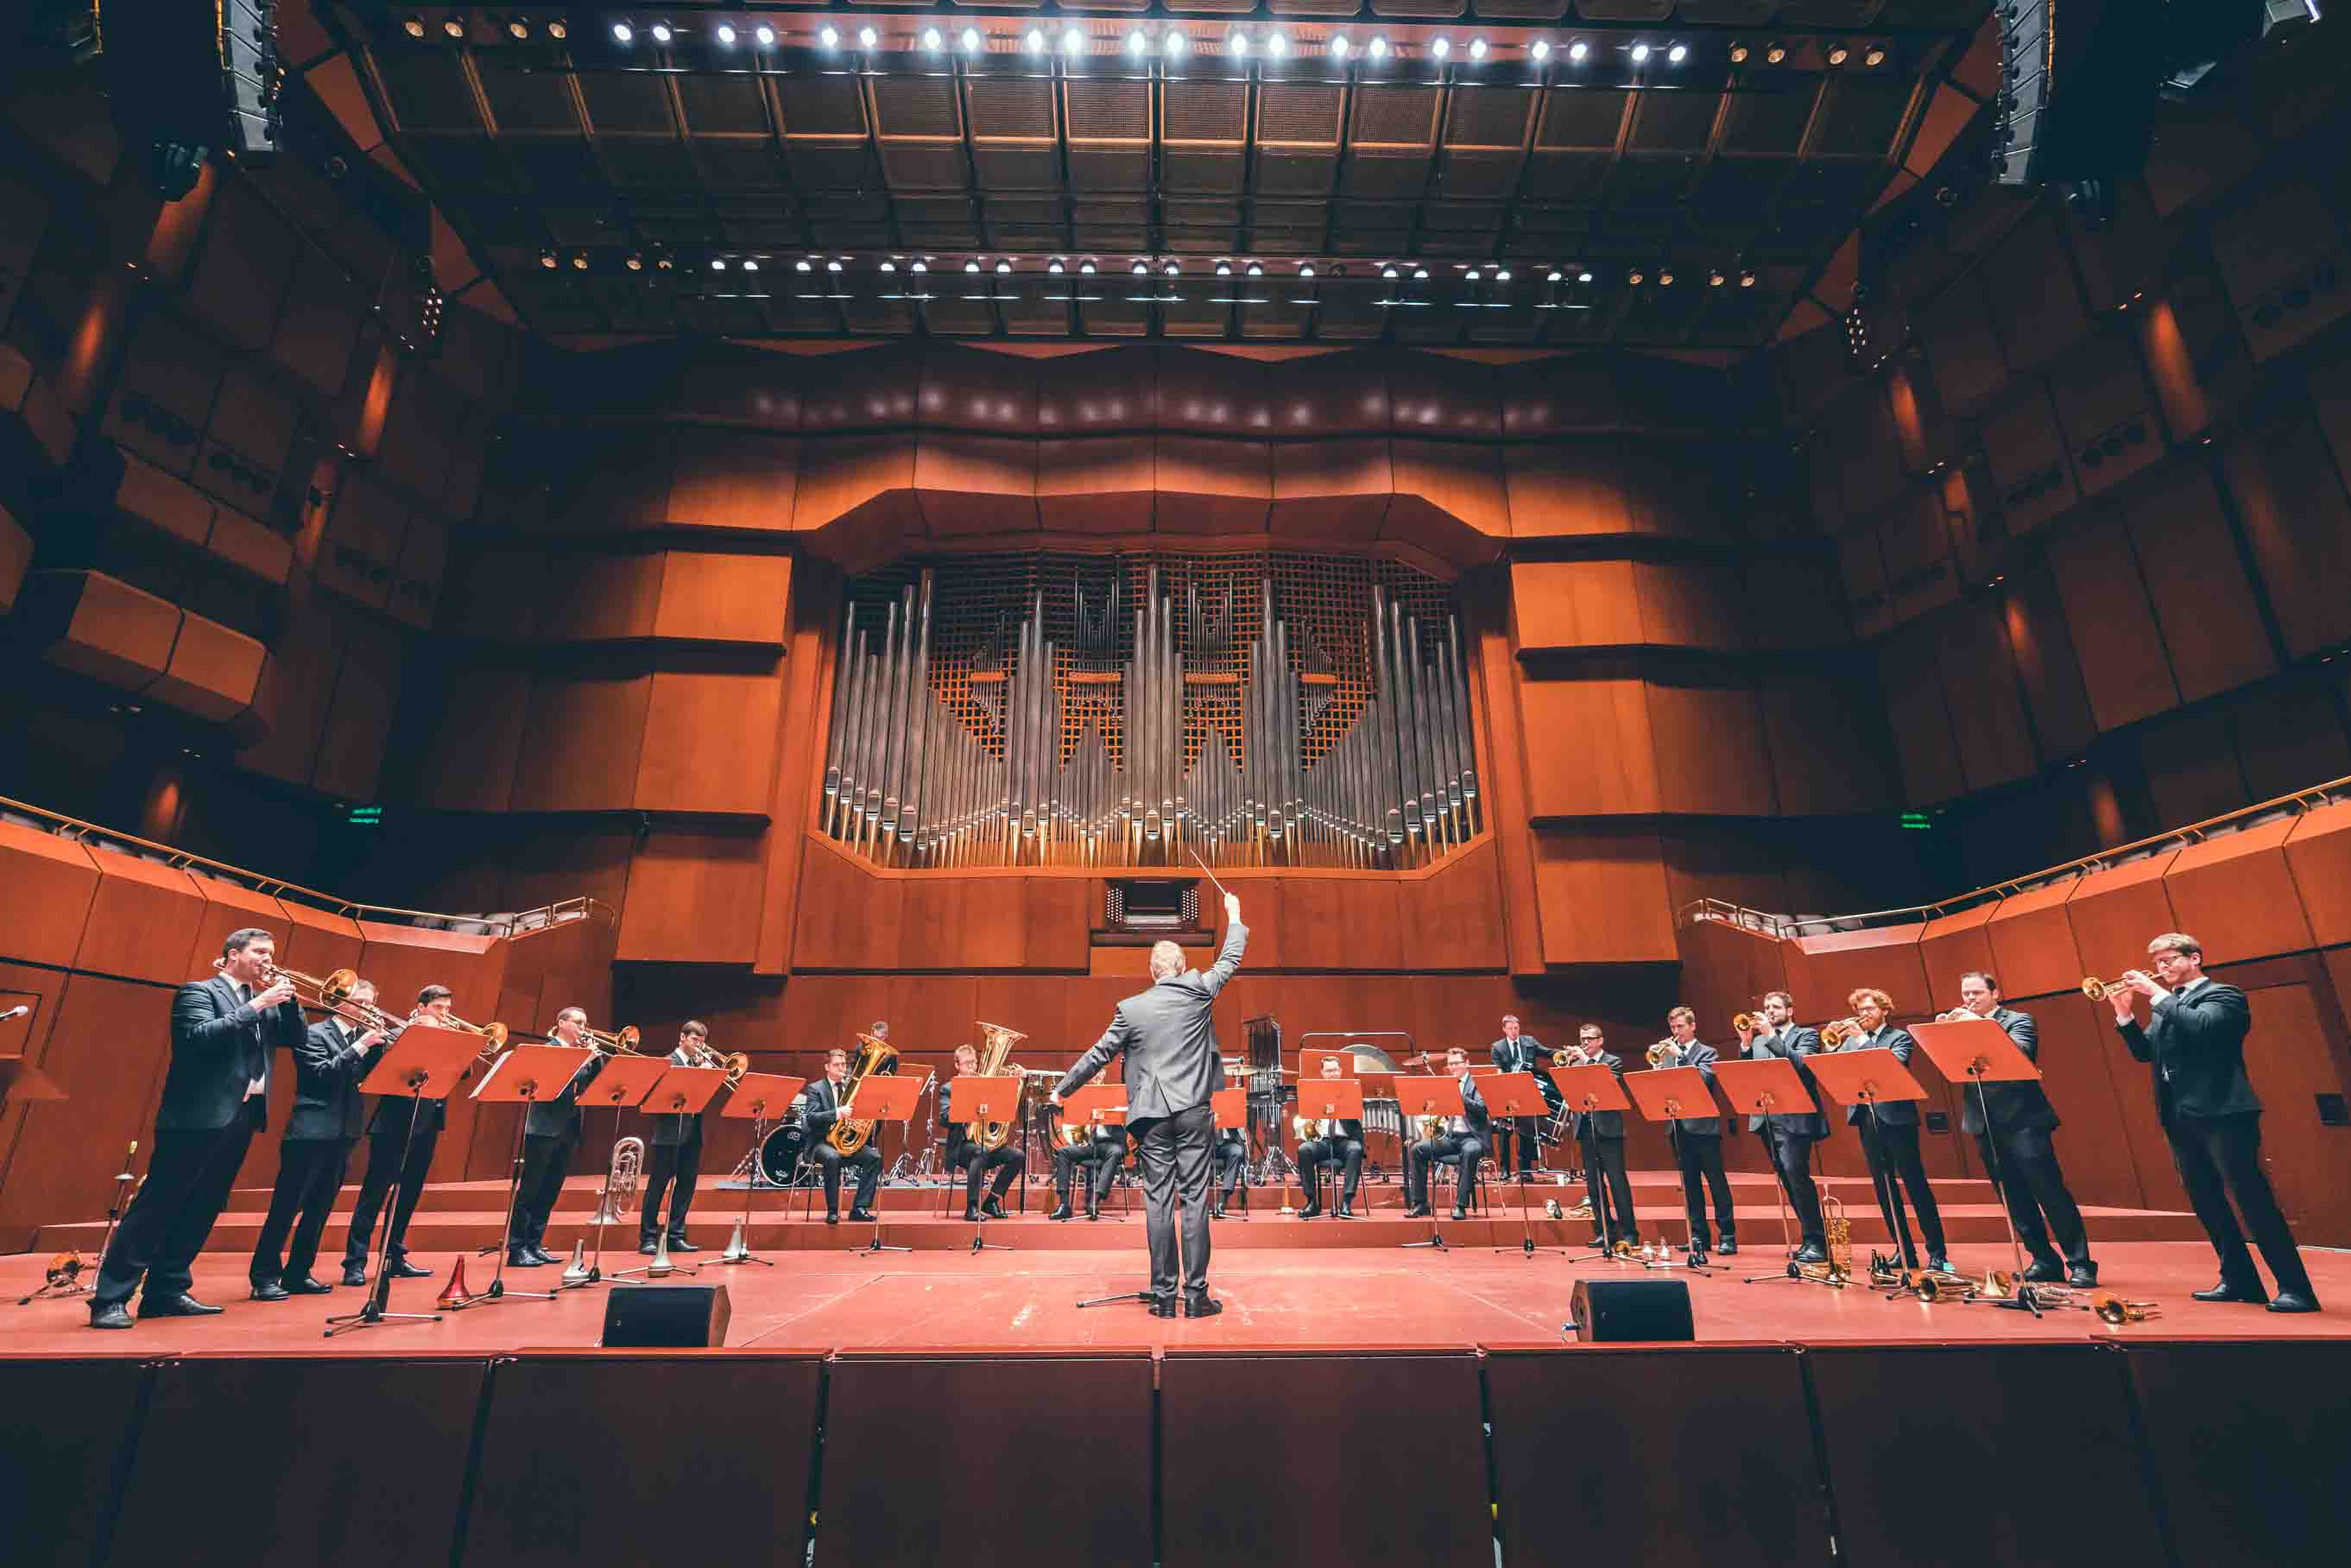 Ein Konzertsaal voller Blechbläßer.